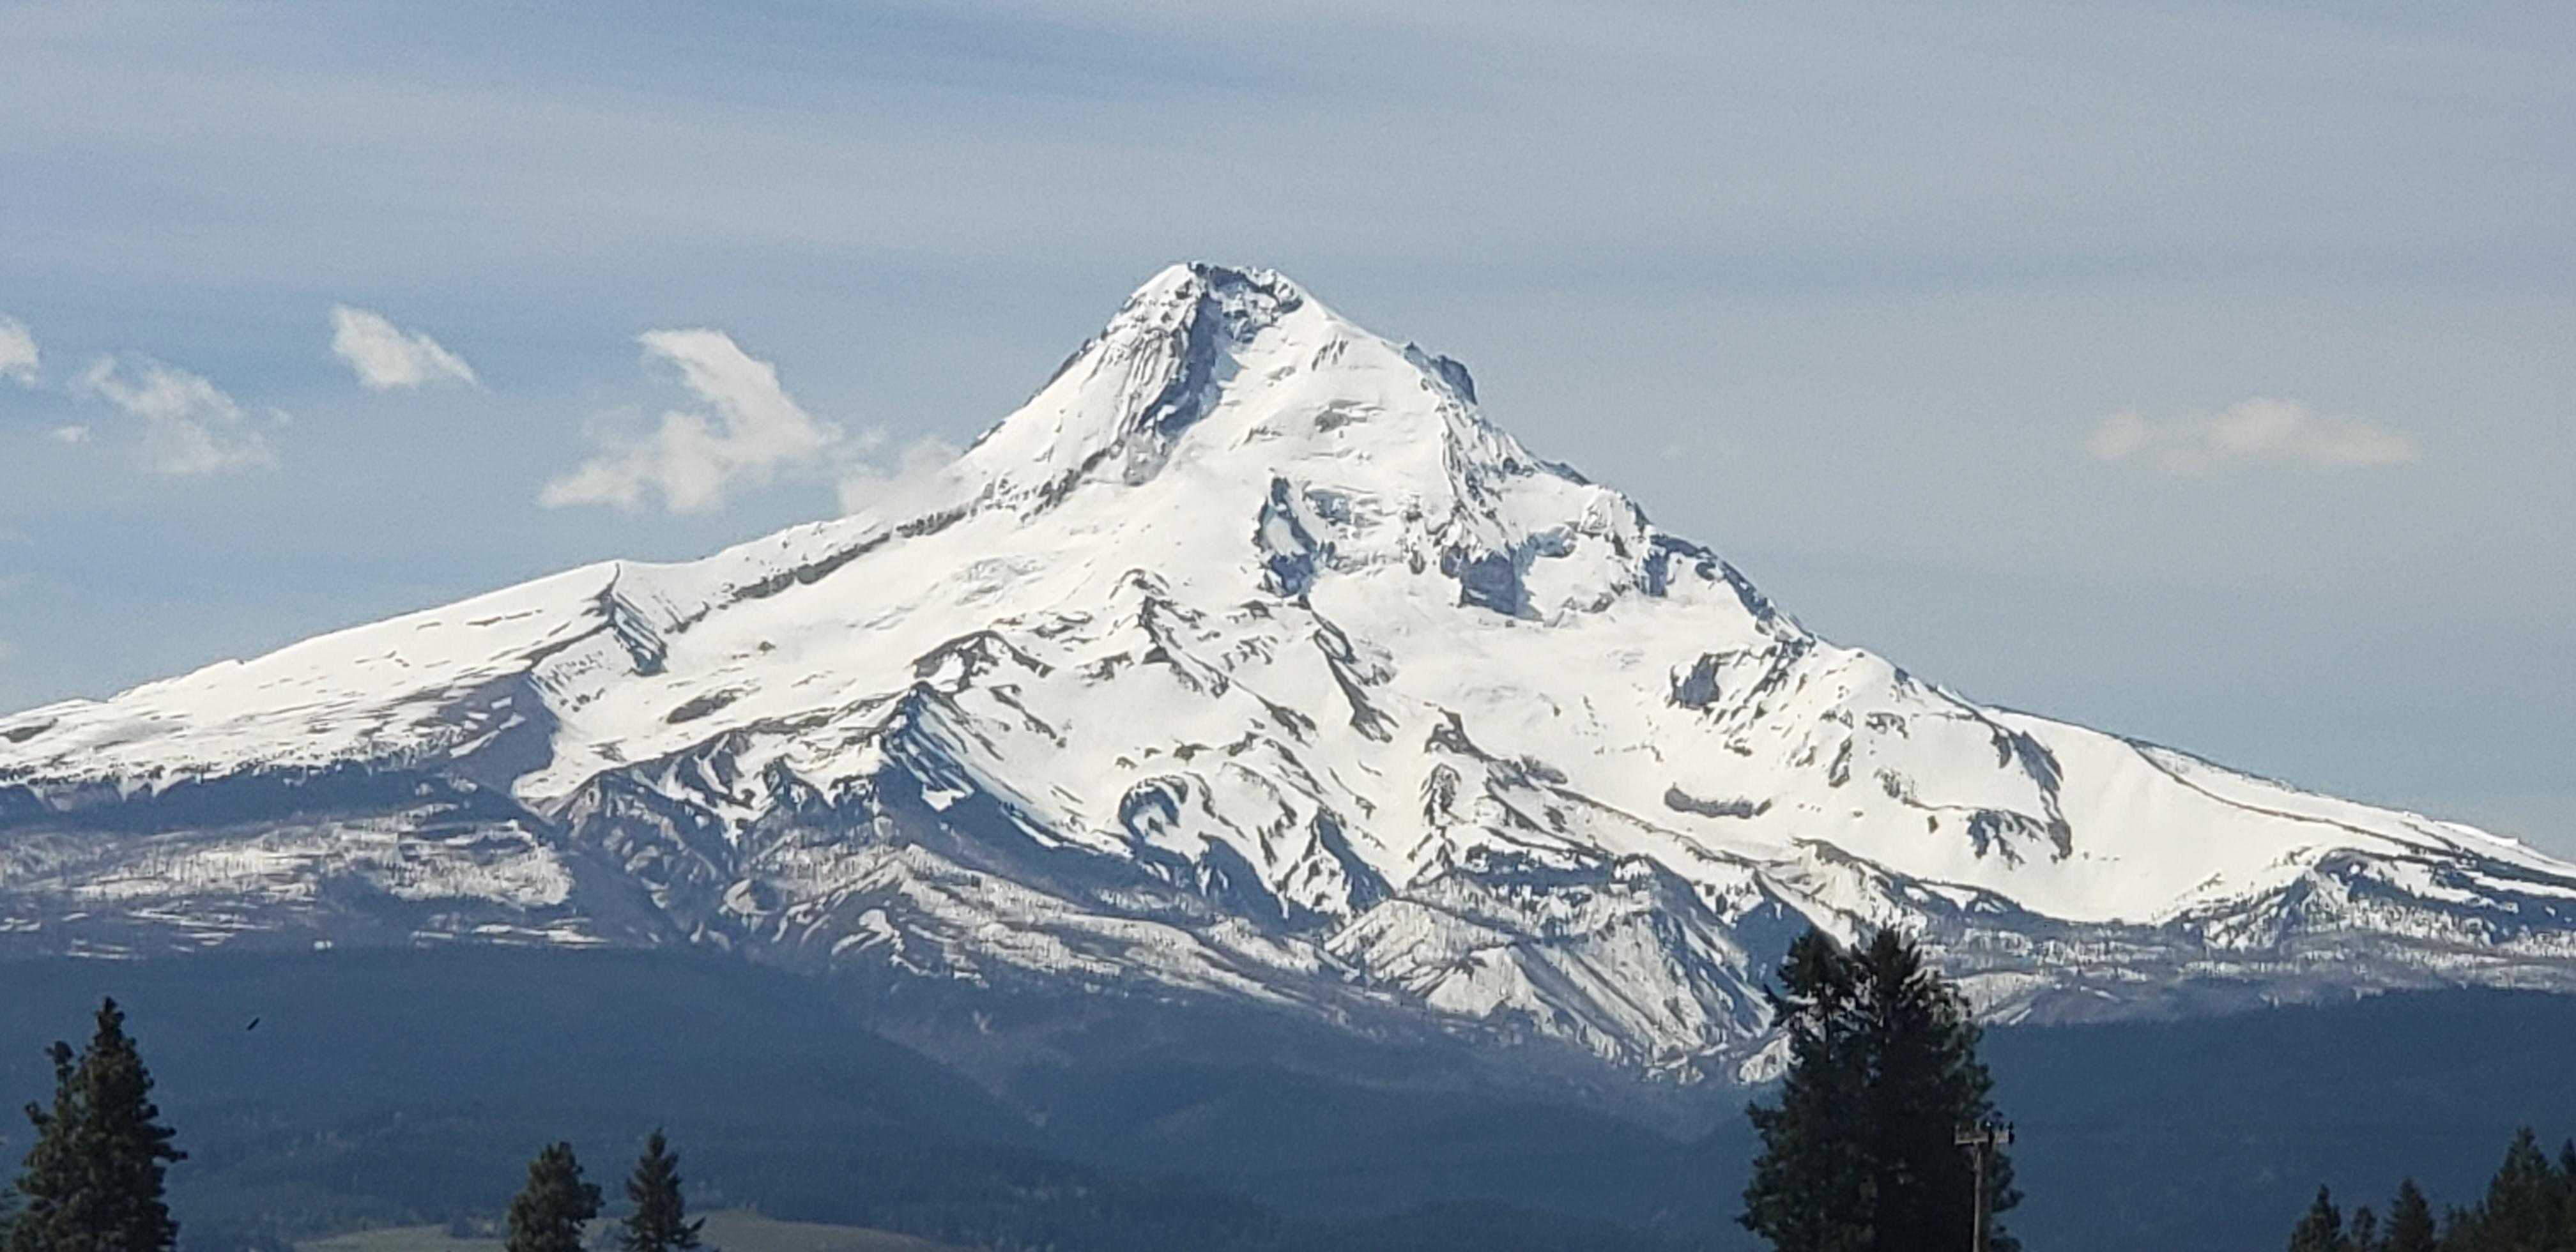 2_Oregon_Sherman_Mt. Hood_2021